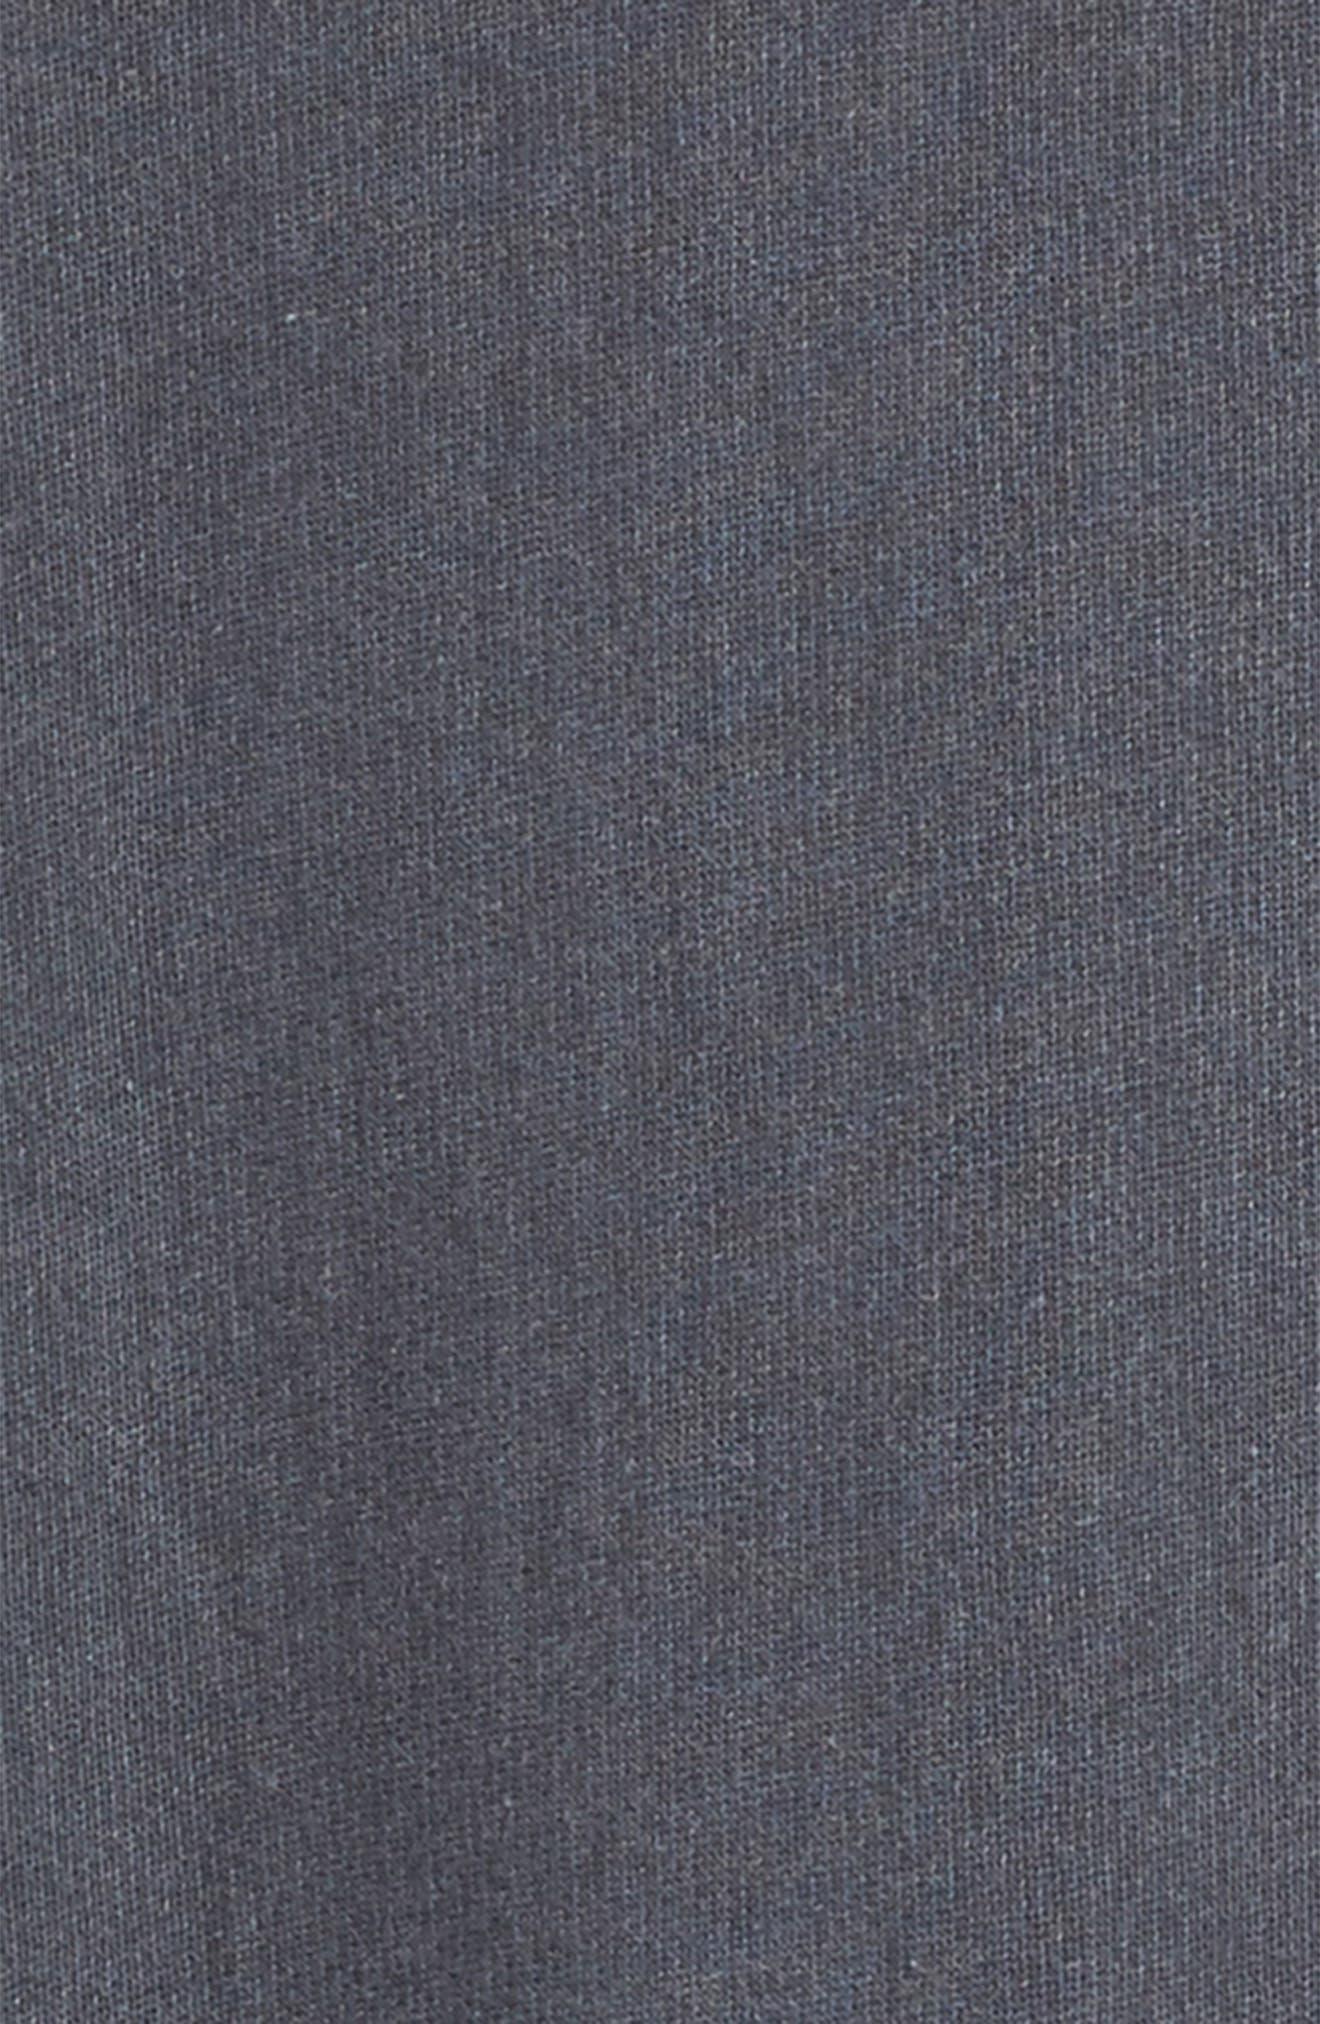 Alternate Image 2  - Treasure & Bond Hooded Fleece Sweatshirt Dress (Big Girls)